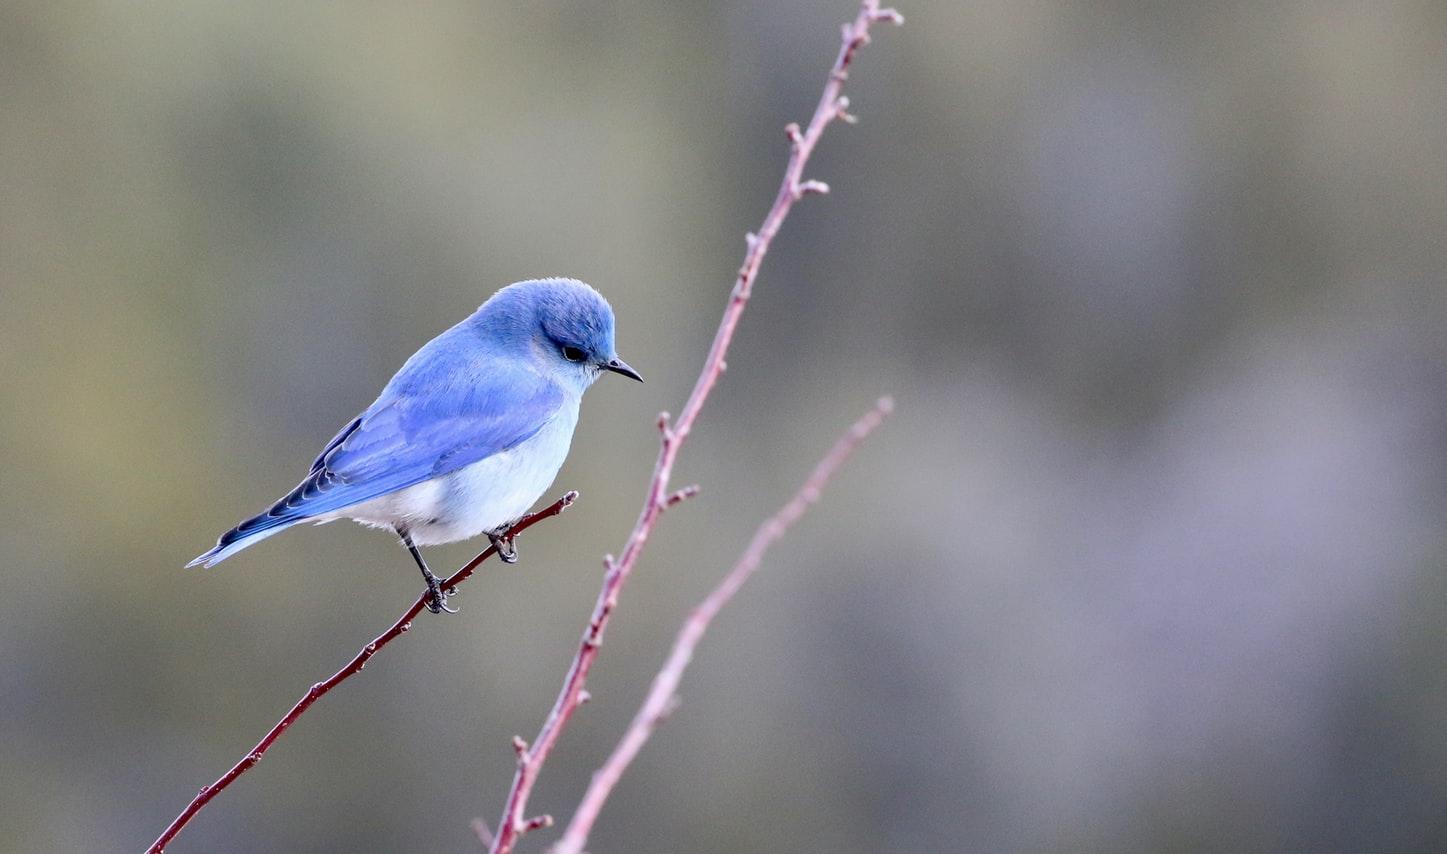 blue bird that looks like the Twitter logo